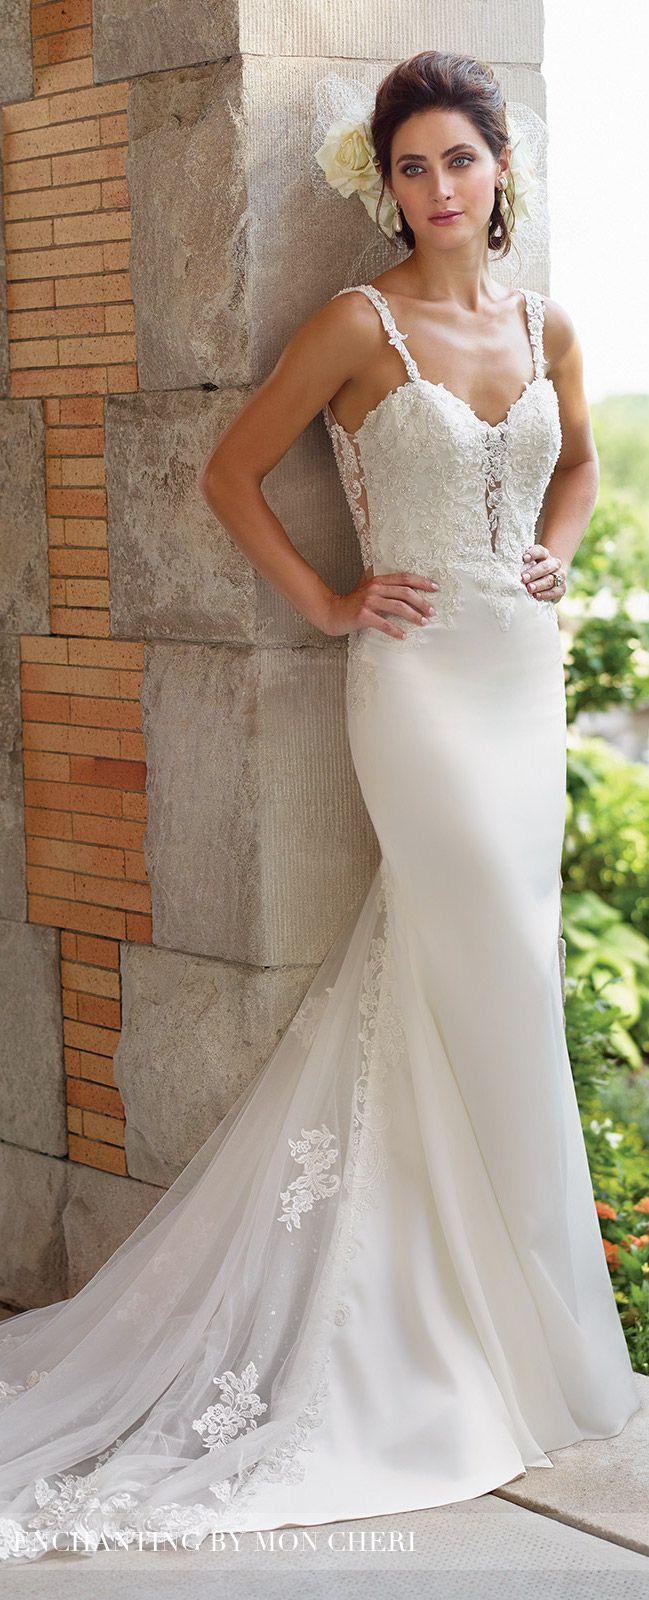 Wedding dresses illustration description plunging neckline wedding